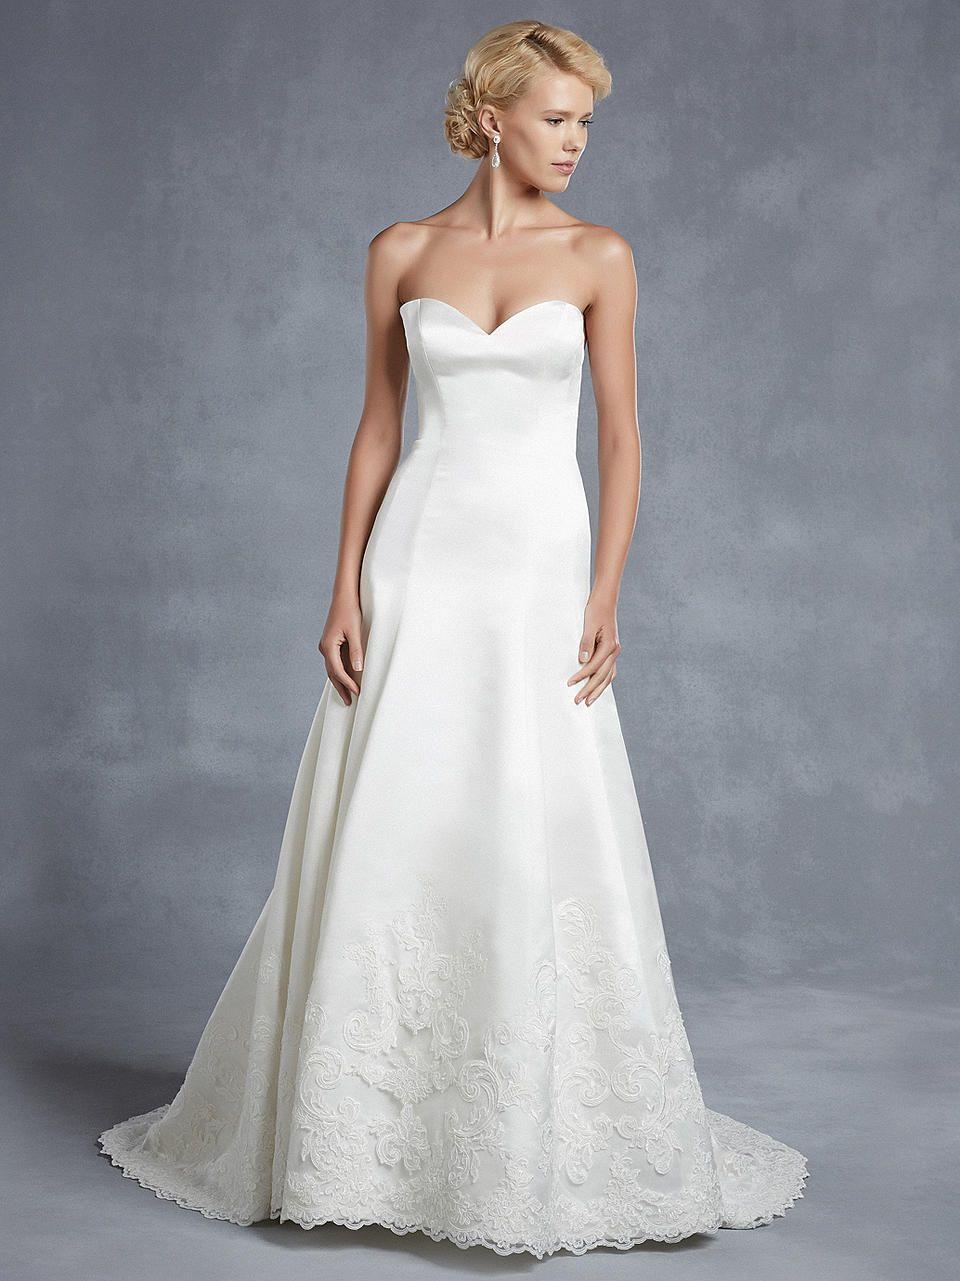 Contemporary Wedding Dress Shops Harrogate Inspiration - All Wedding ...